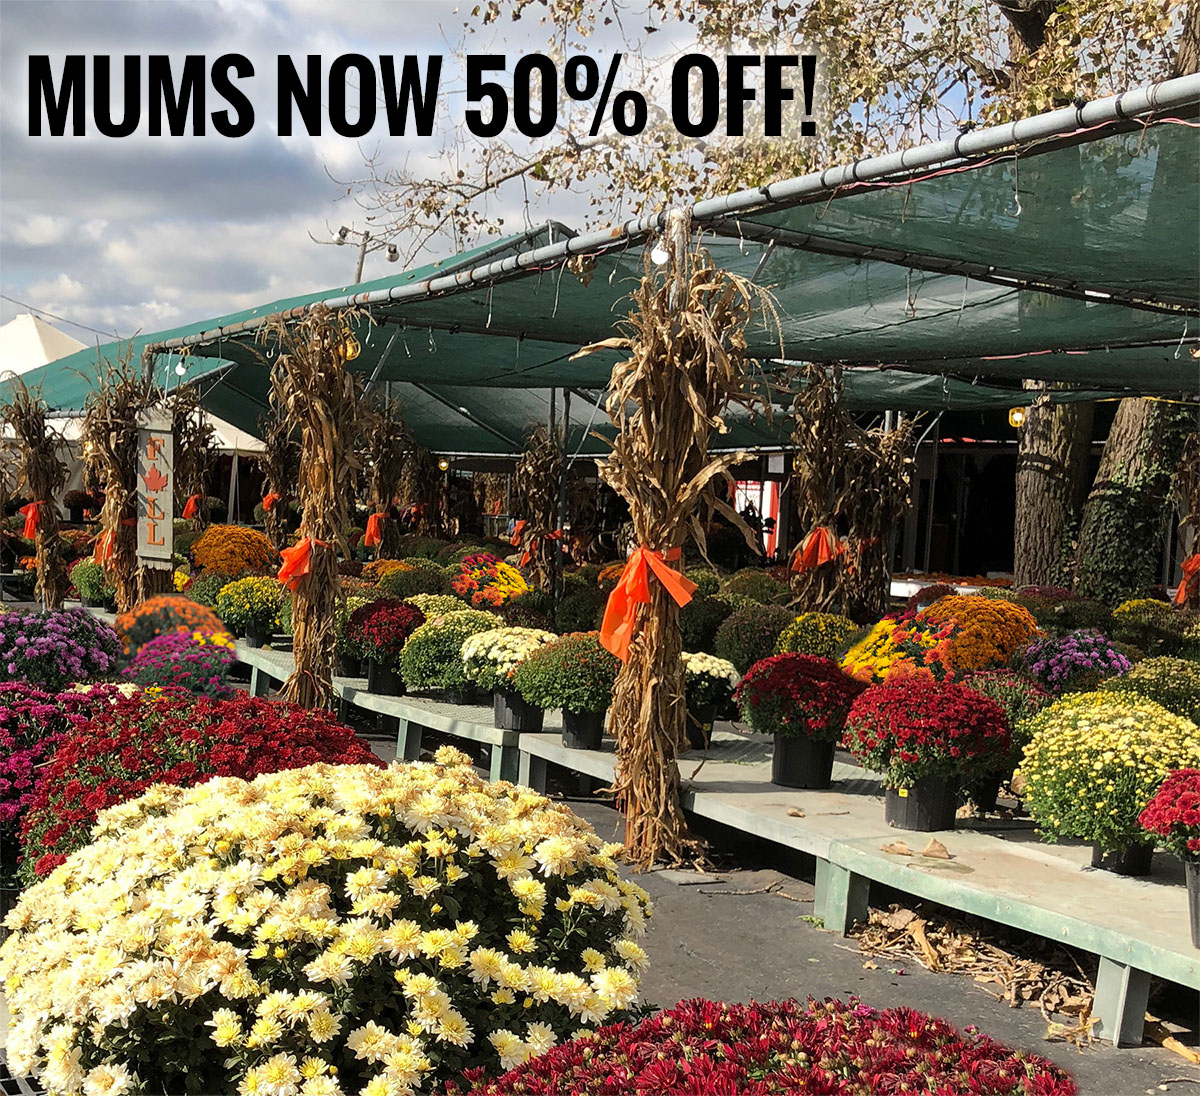 Johansen Farms Children's Zoo, Pumpkin Patch & Fall Festival - Our Mums are now 50% off!